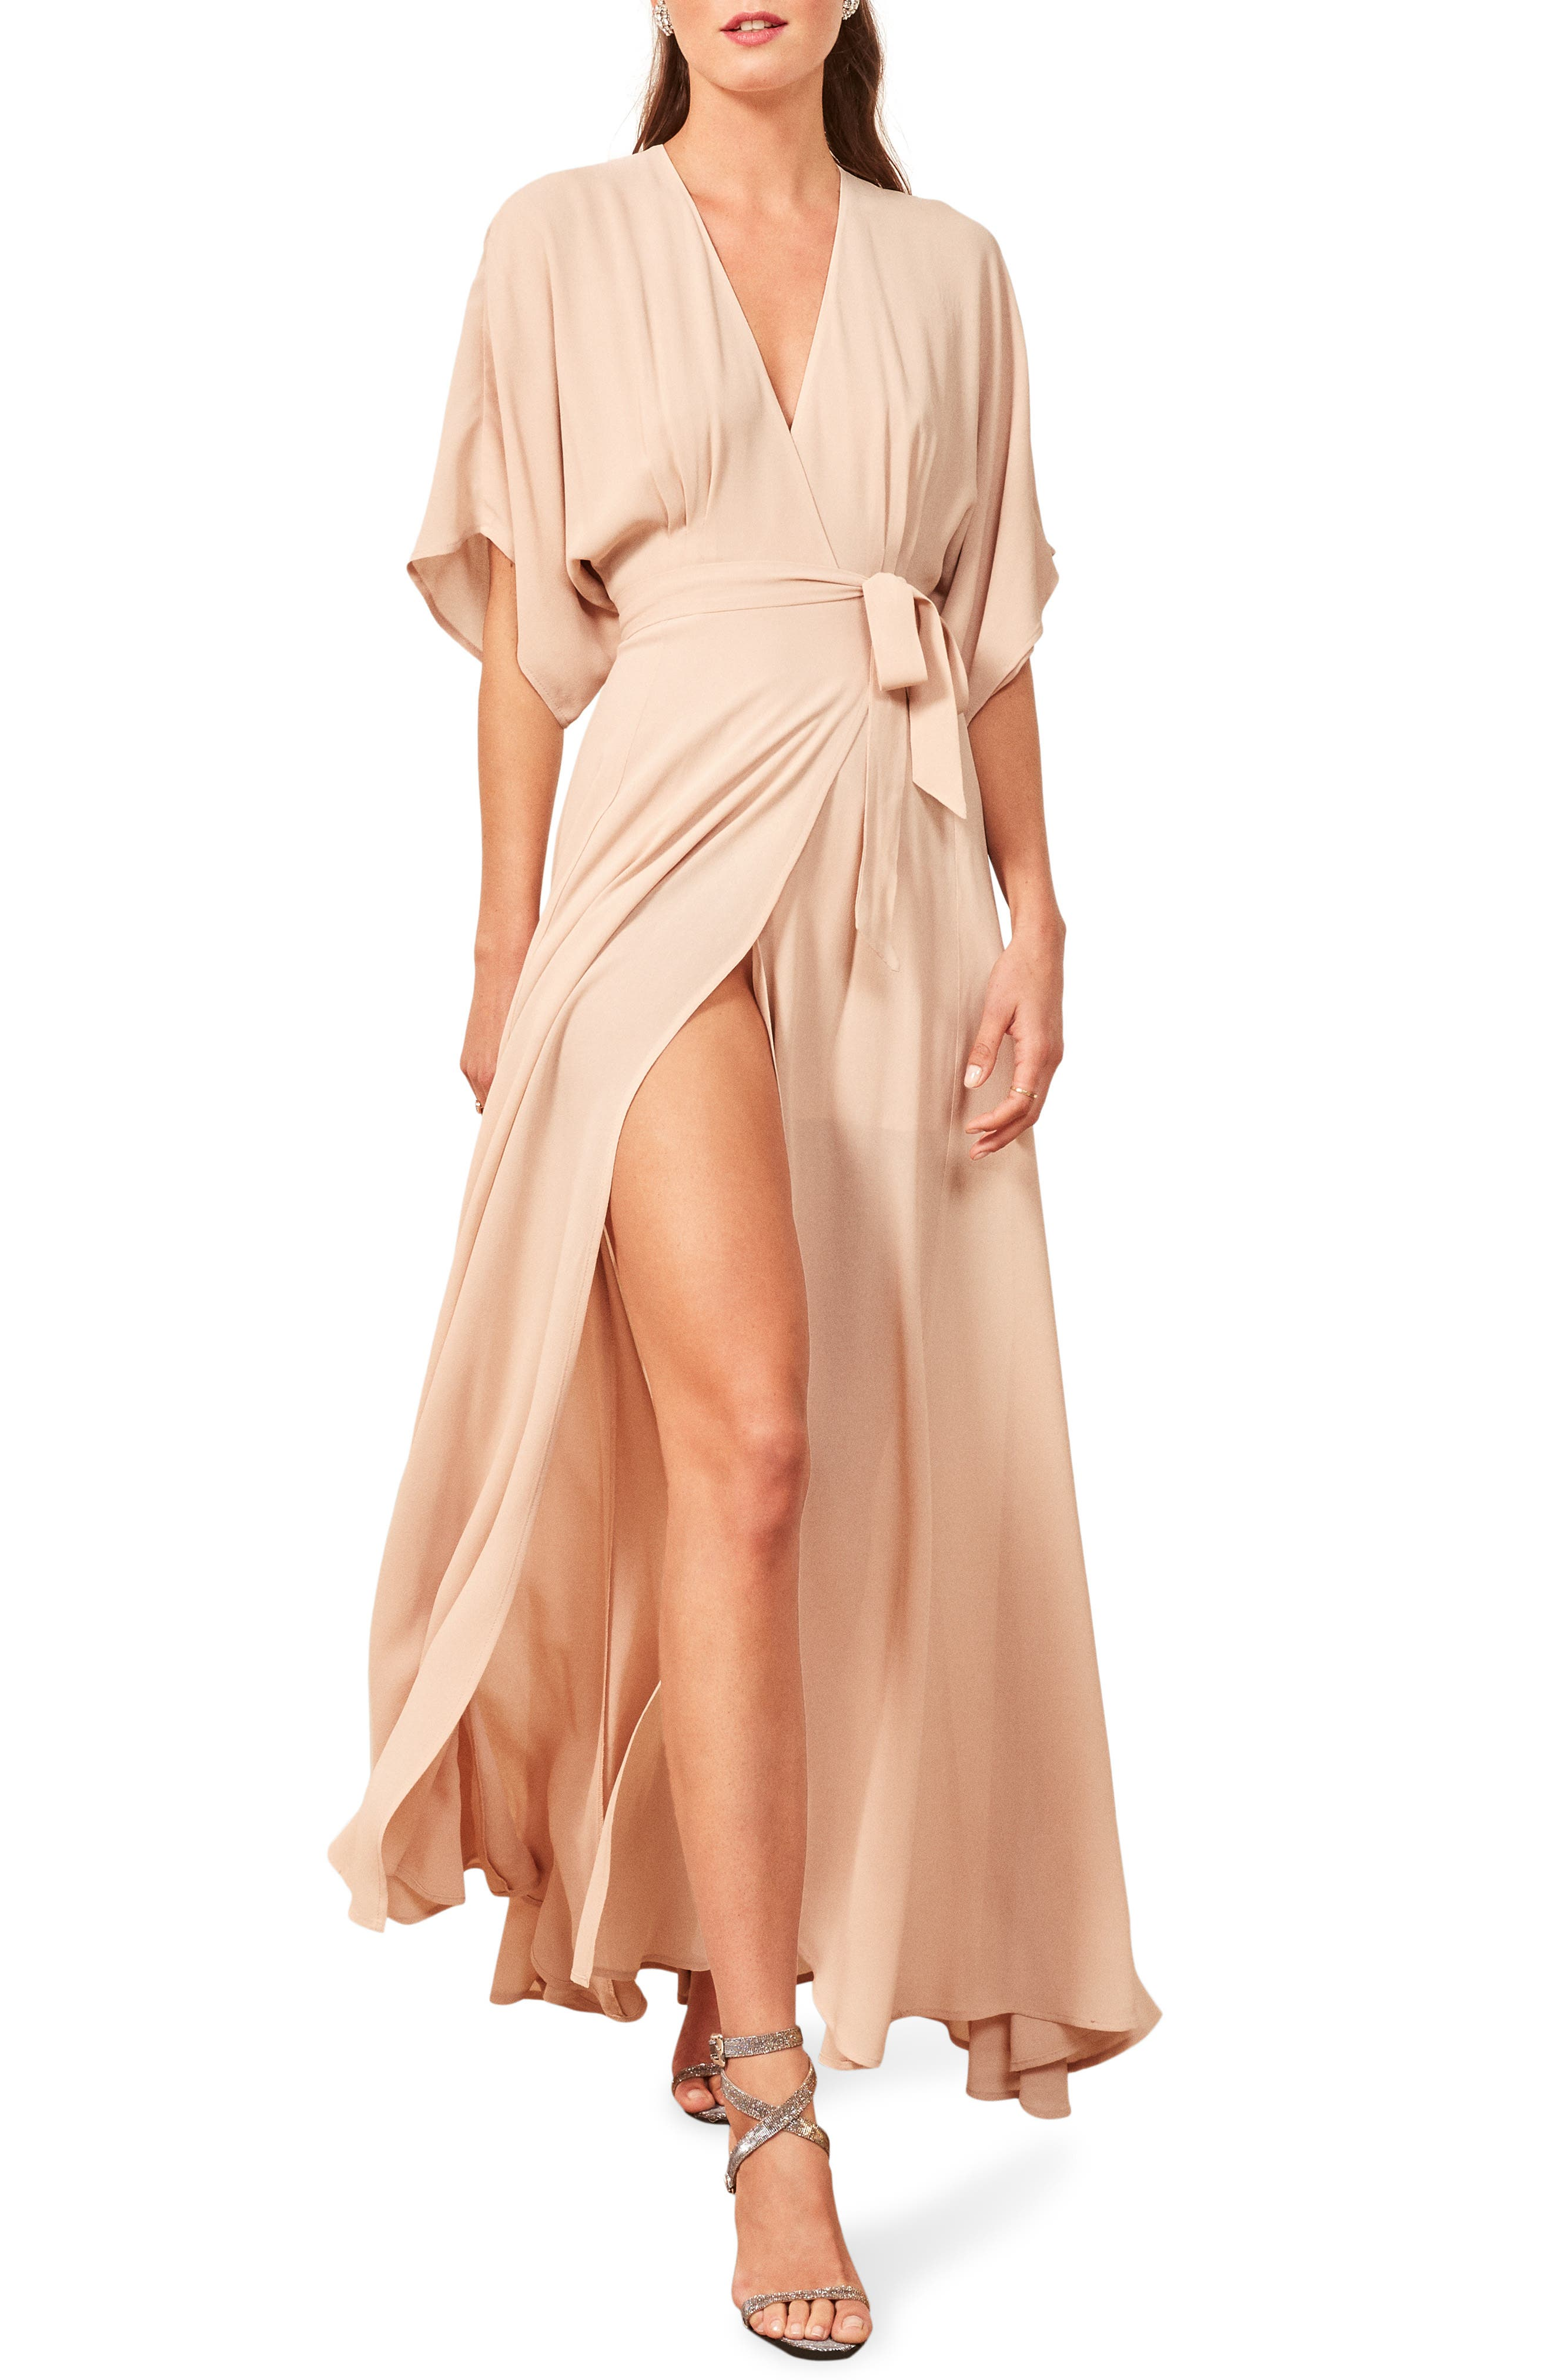 Reformation Winslow Maxi Dress, Beige